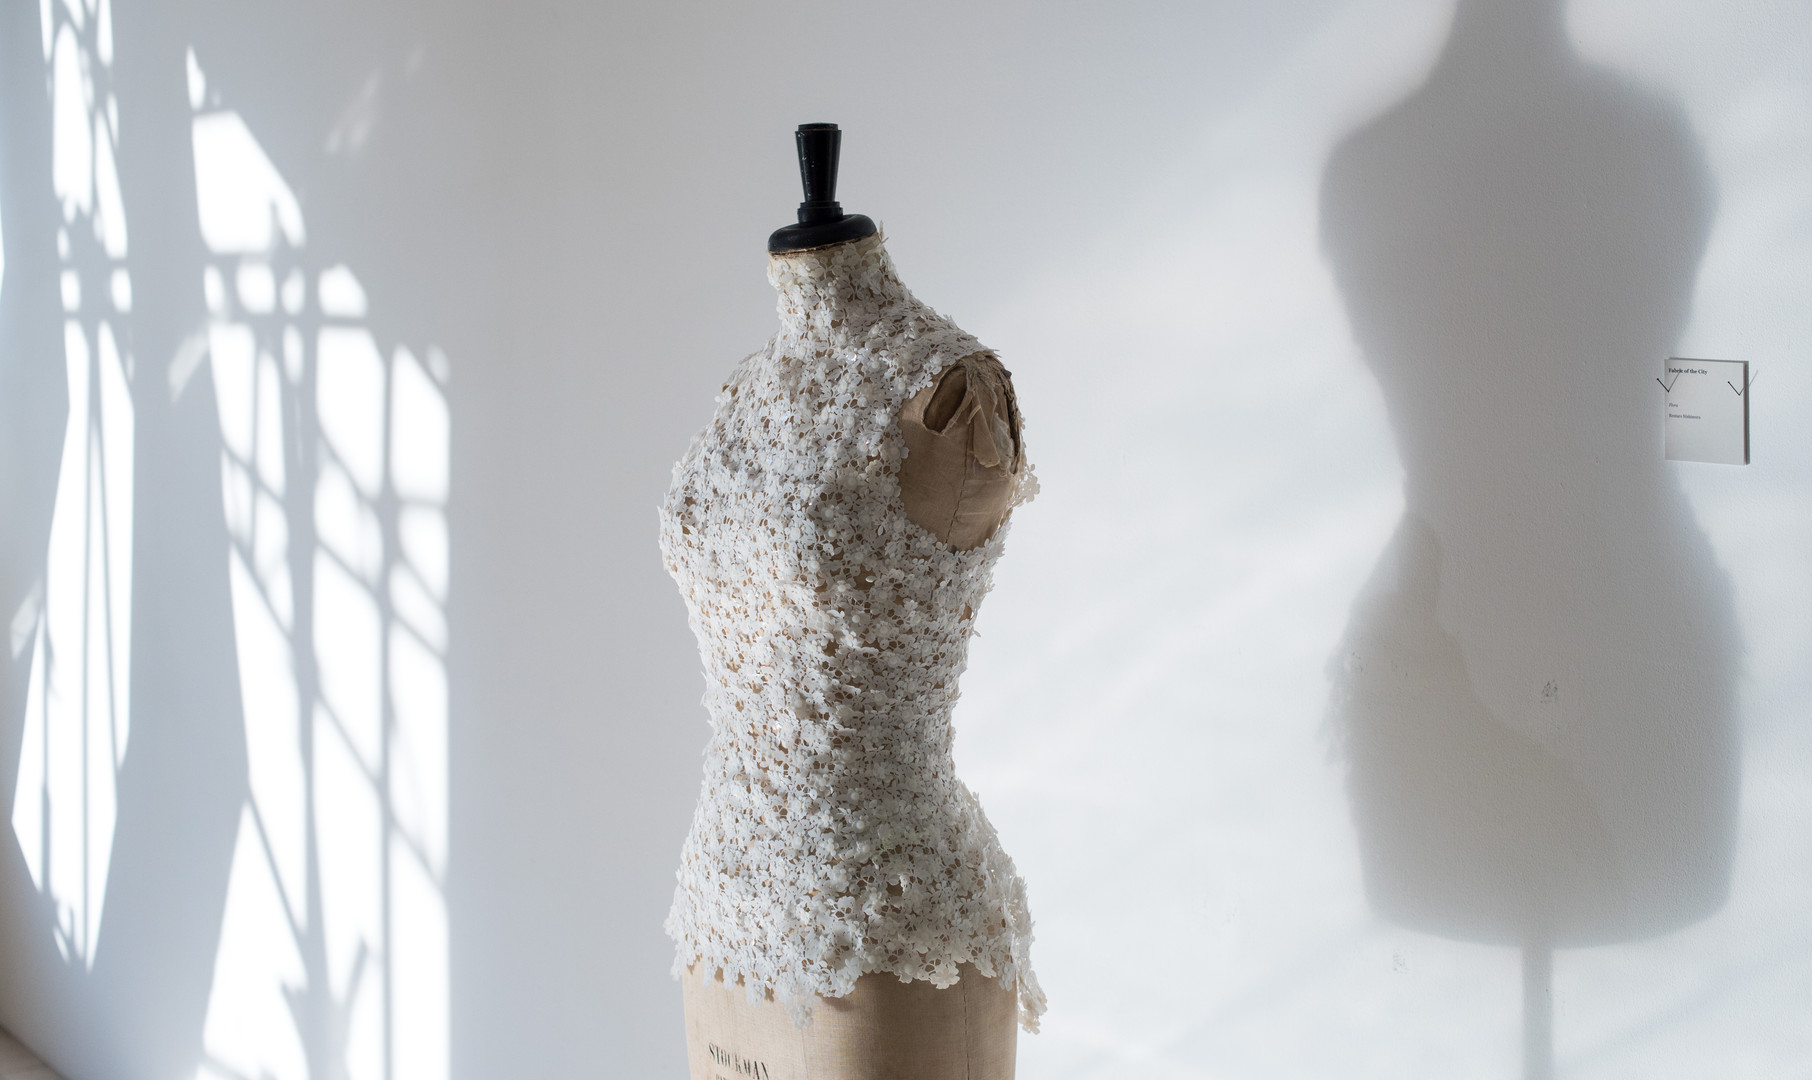 Fabric_of_the_City_PV_0190.jpg